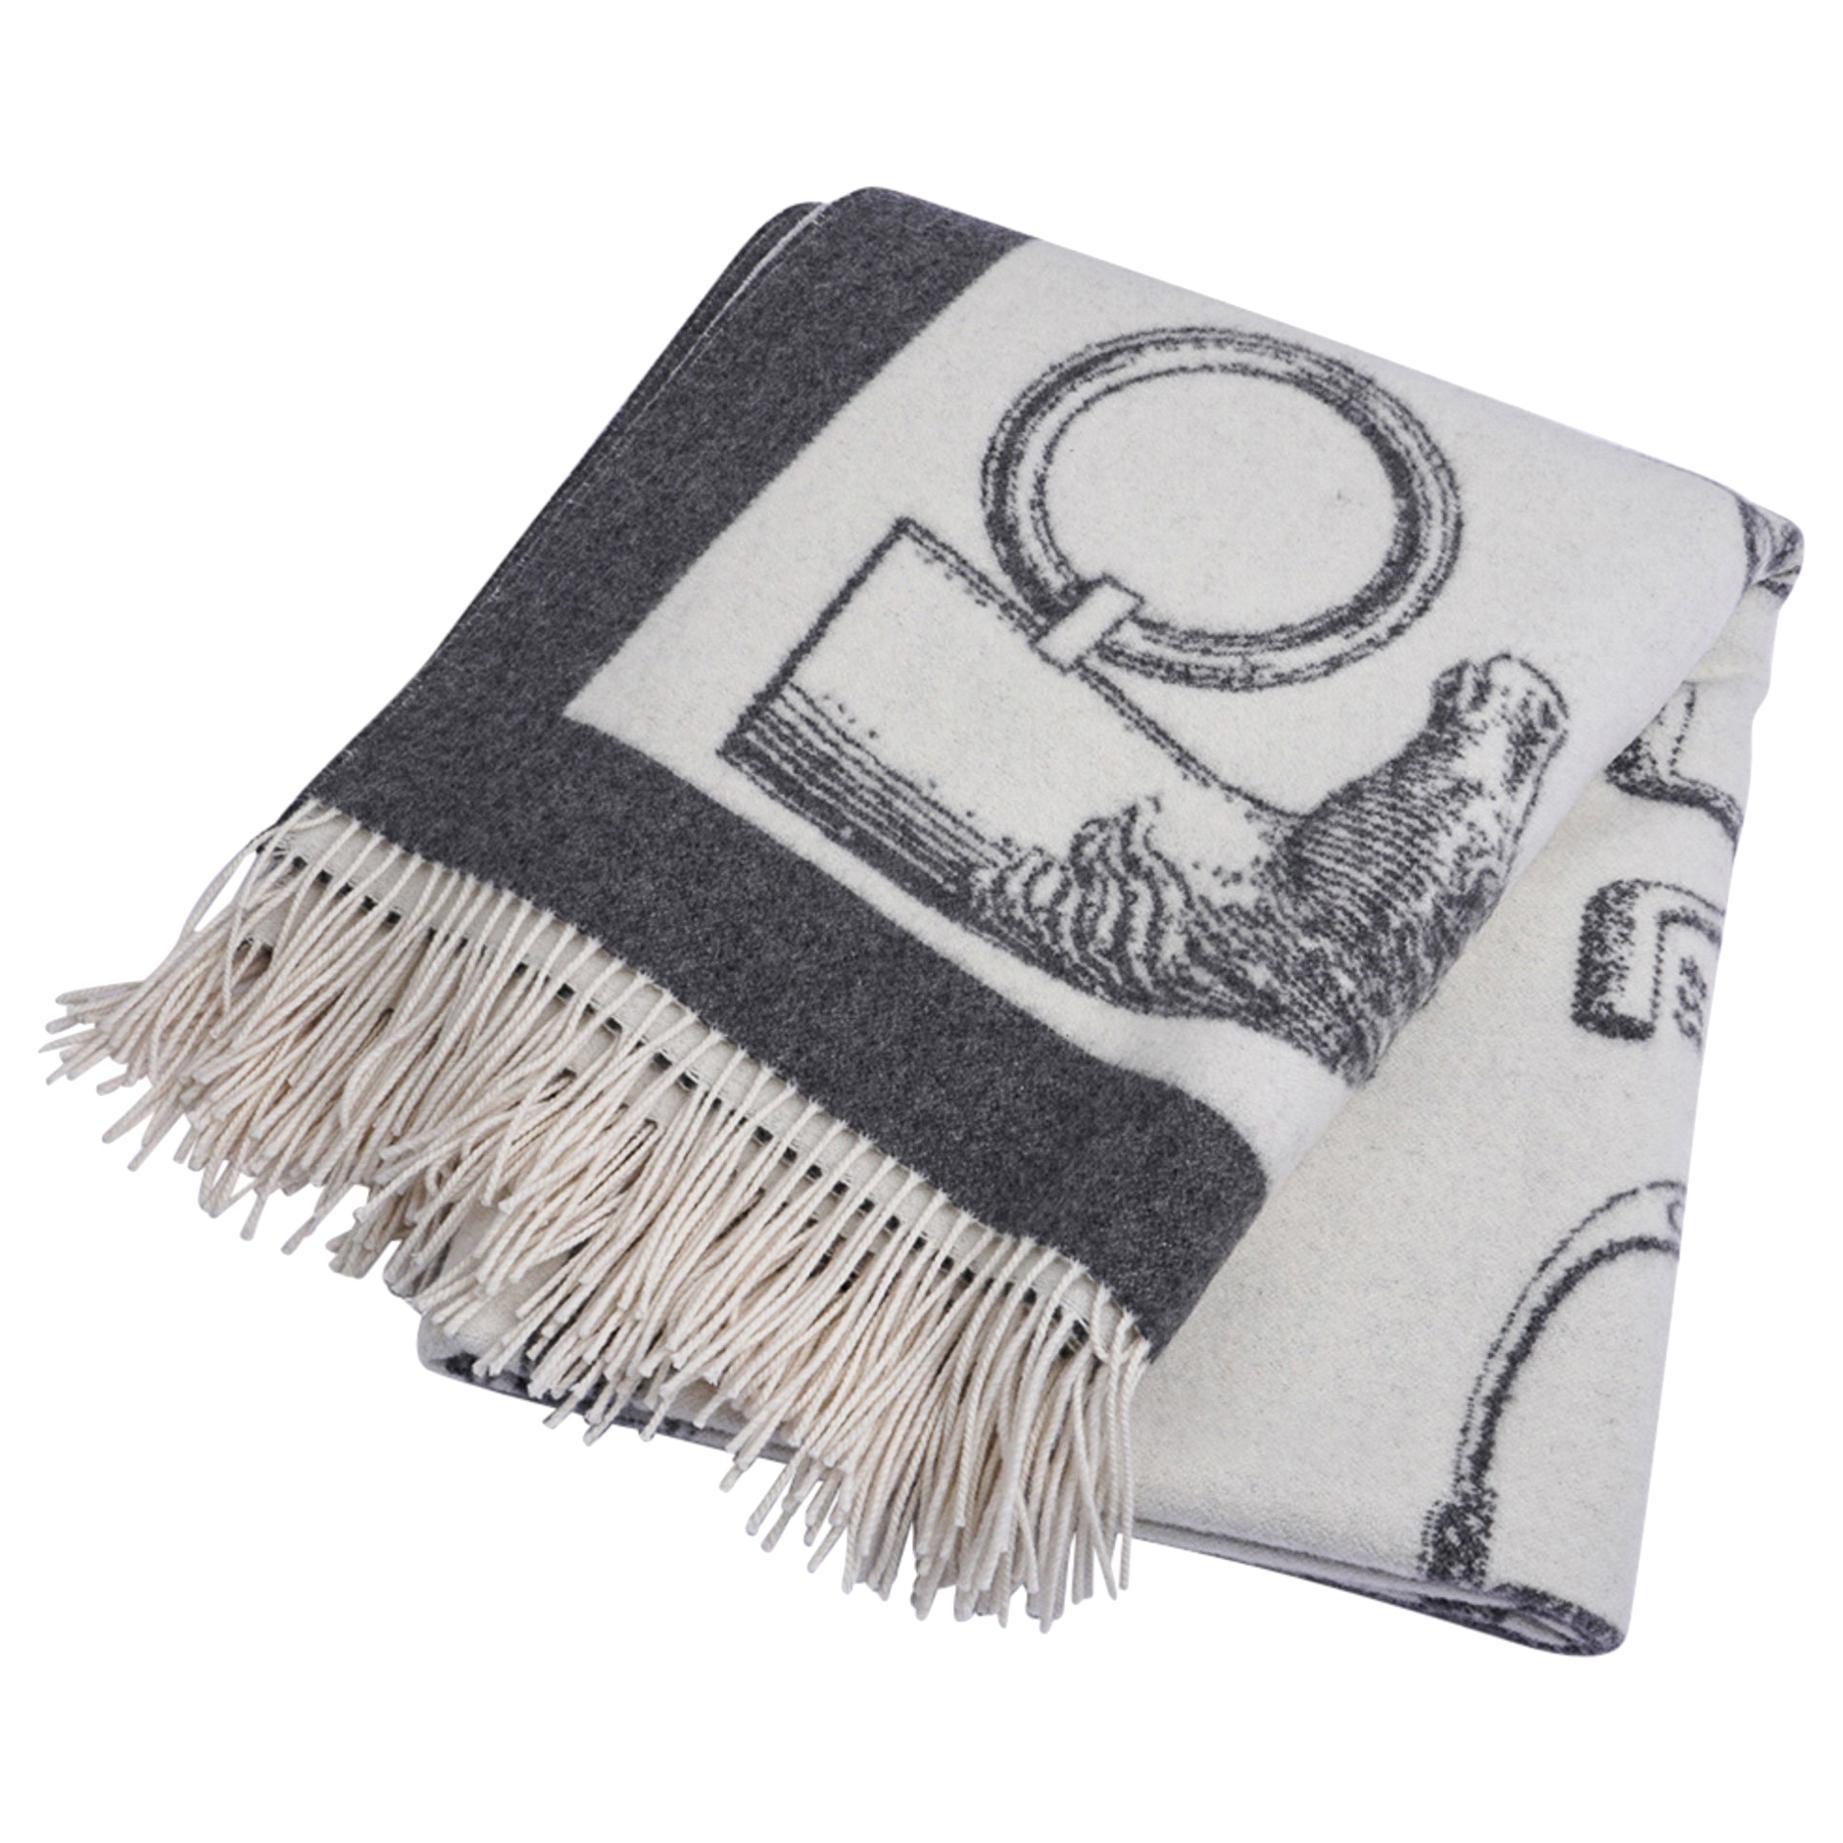 Hermes Blanket Metalliers Equestrian Throw Gris / Ecru Limited Edition New